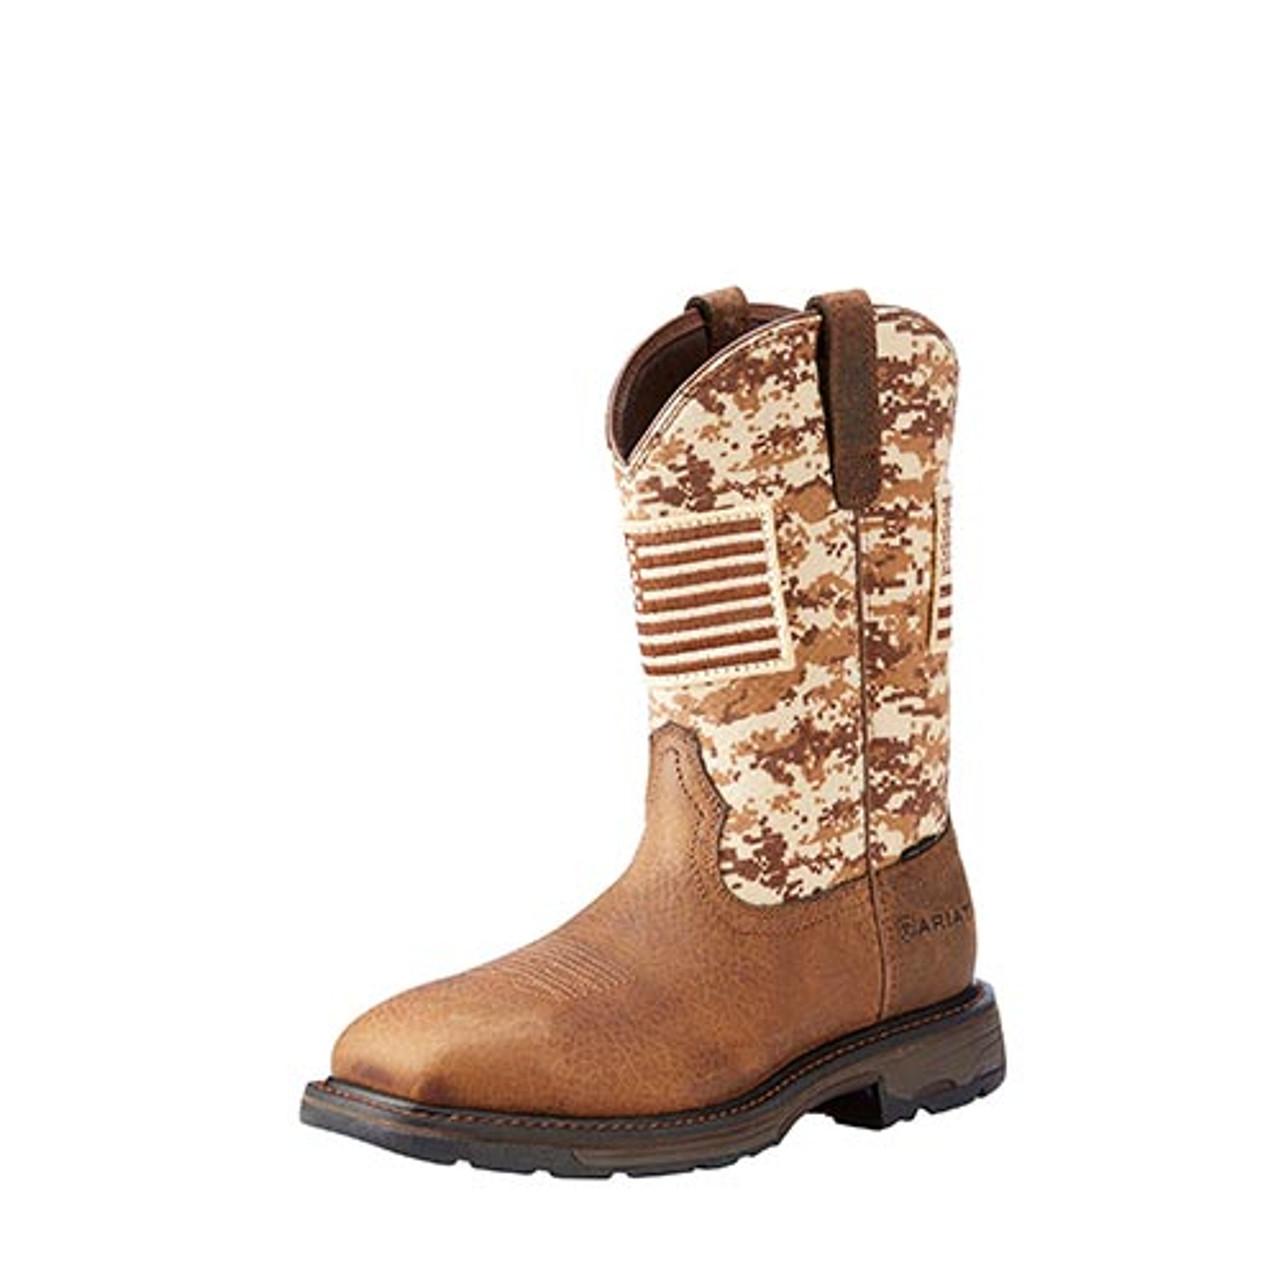 a1e3cb83973 Ariat Men's Work Boots - Workhog - Patriot - Steel Toe/Slip Resistant -  Earth / Sand Camo